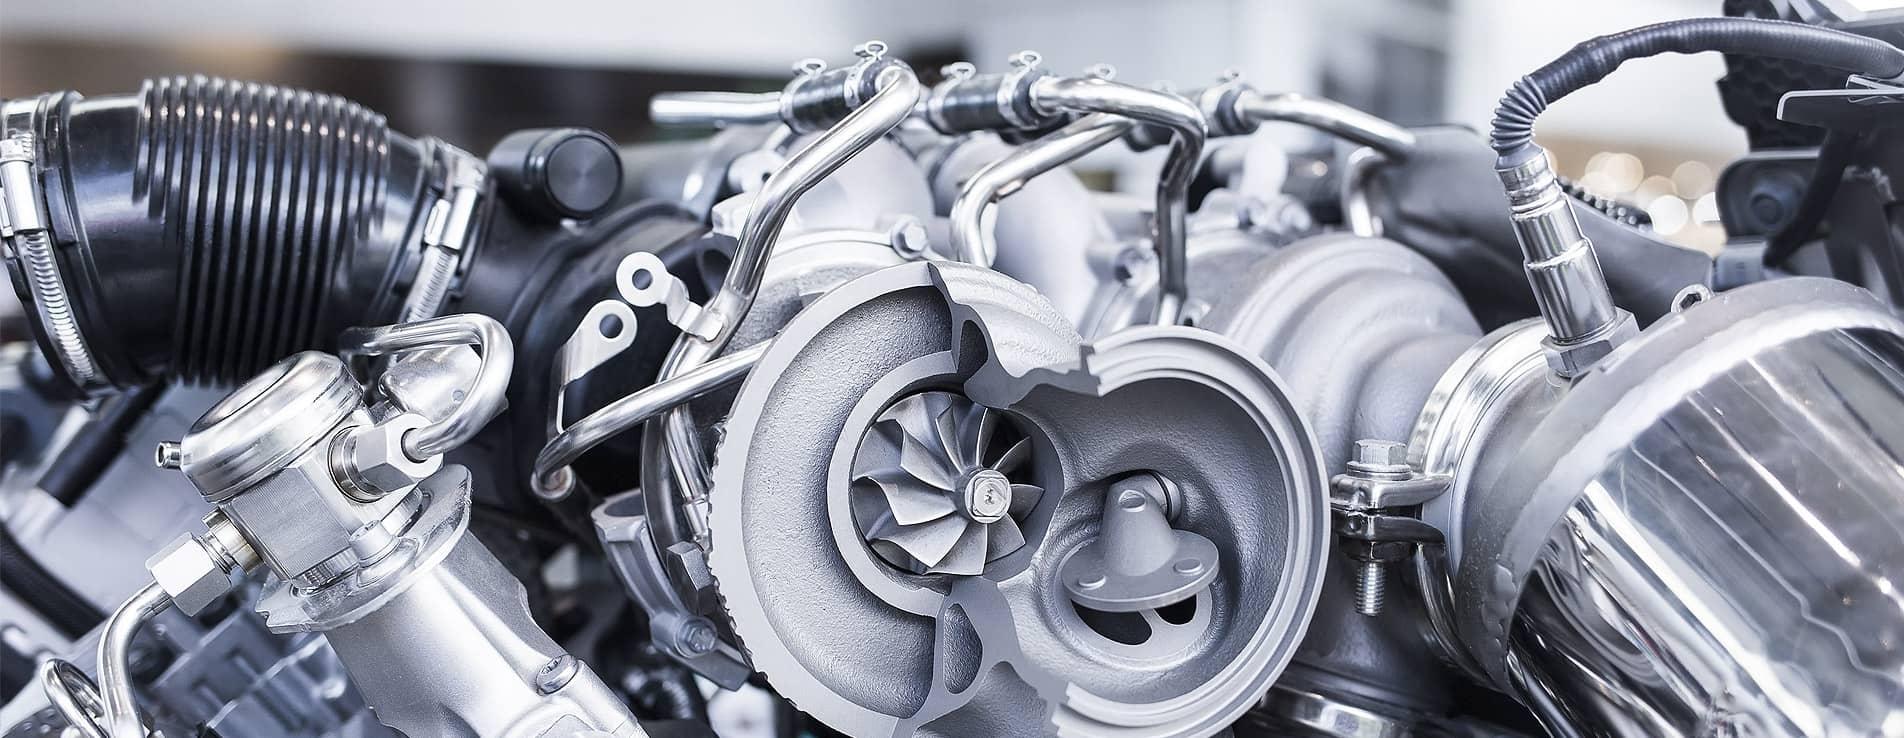 Ladedruckregler Audi A6 3.0 TDI quattro  2967 ccm 218PS 160 KW